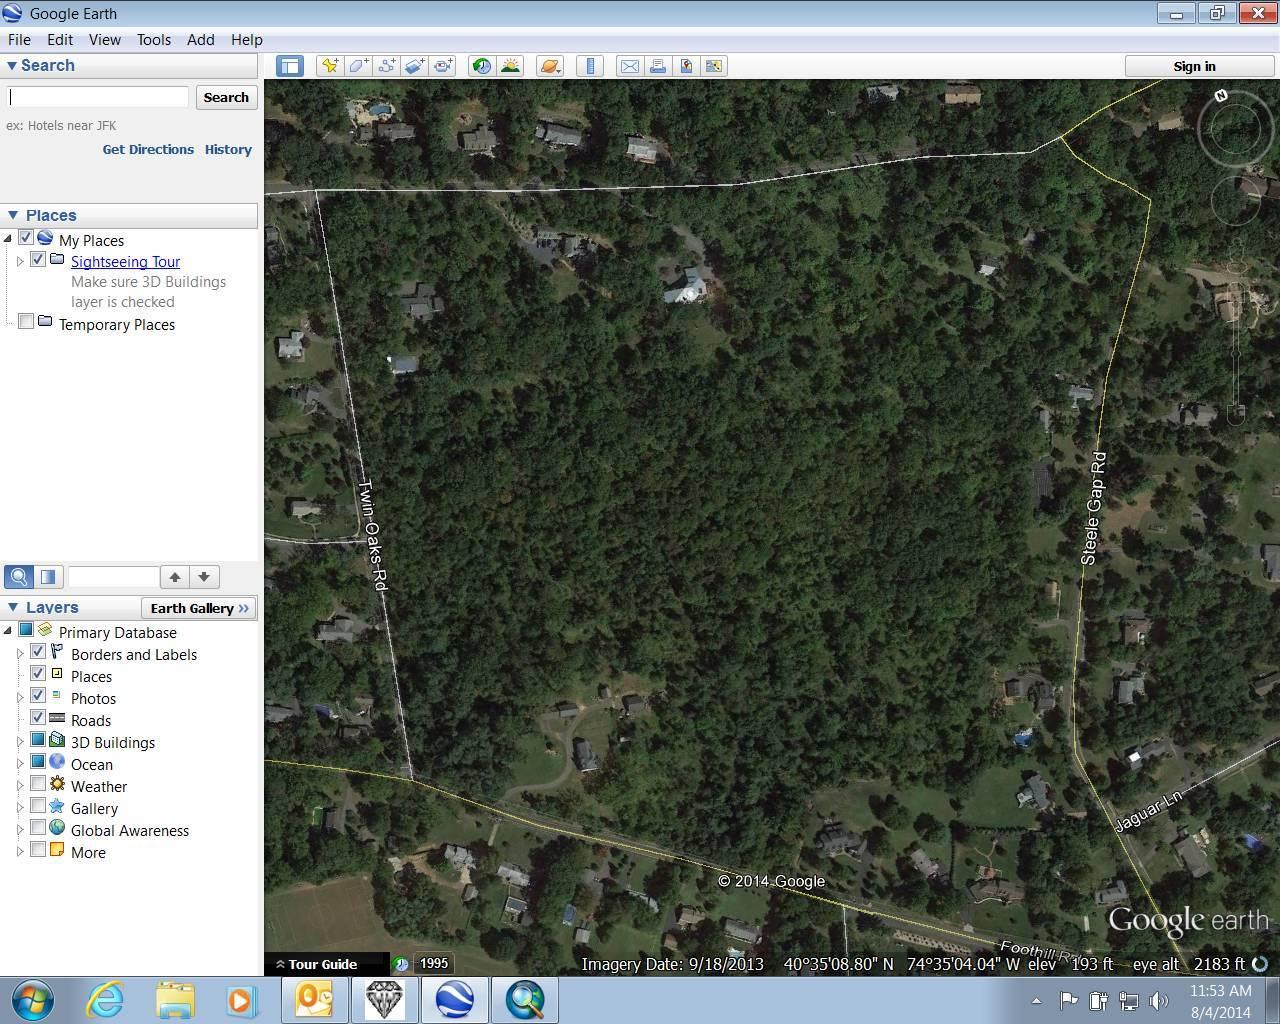 f1f9ea27b4978238ec0e_e93c782d4ca907c81cd4_Wemple_Property.jpg